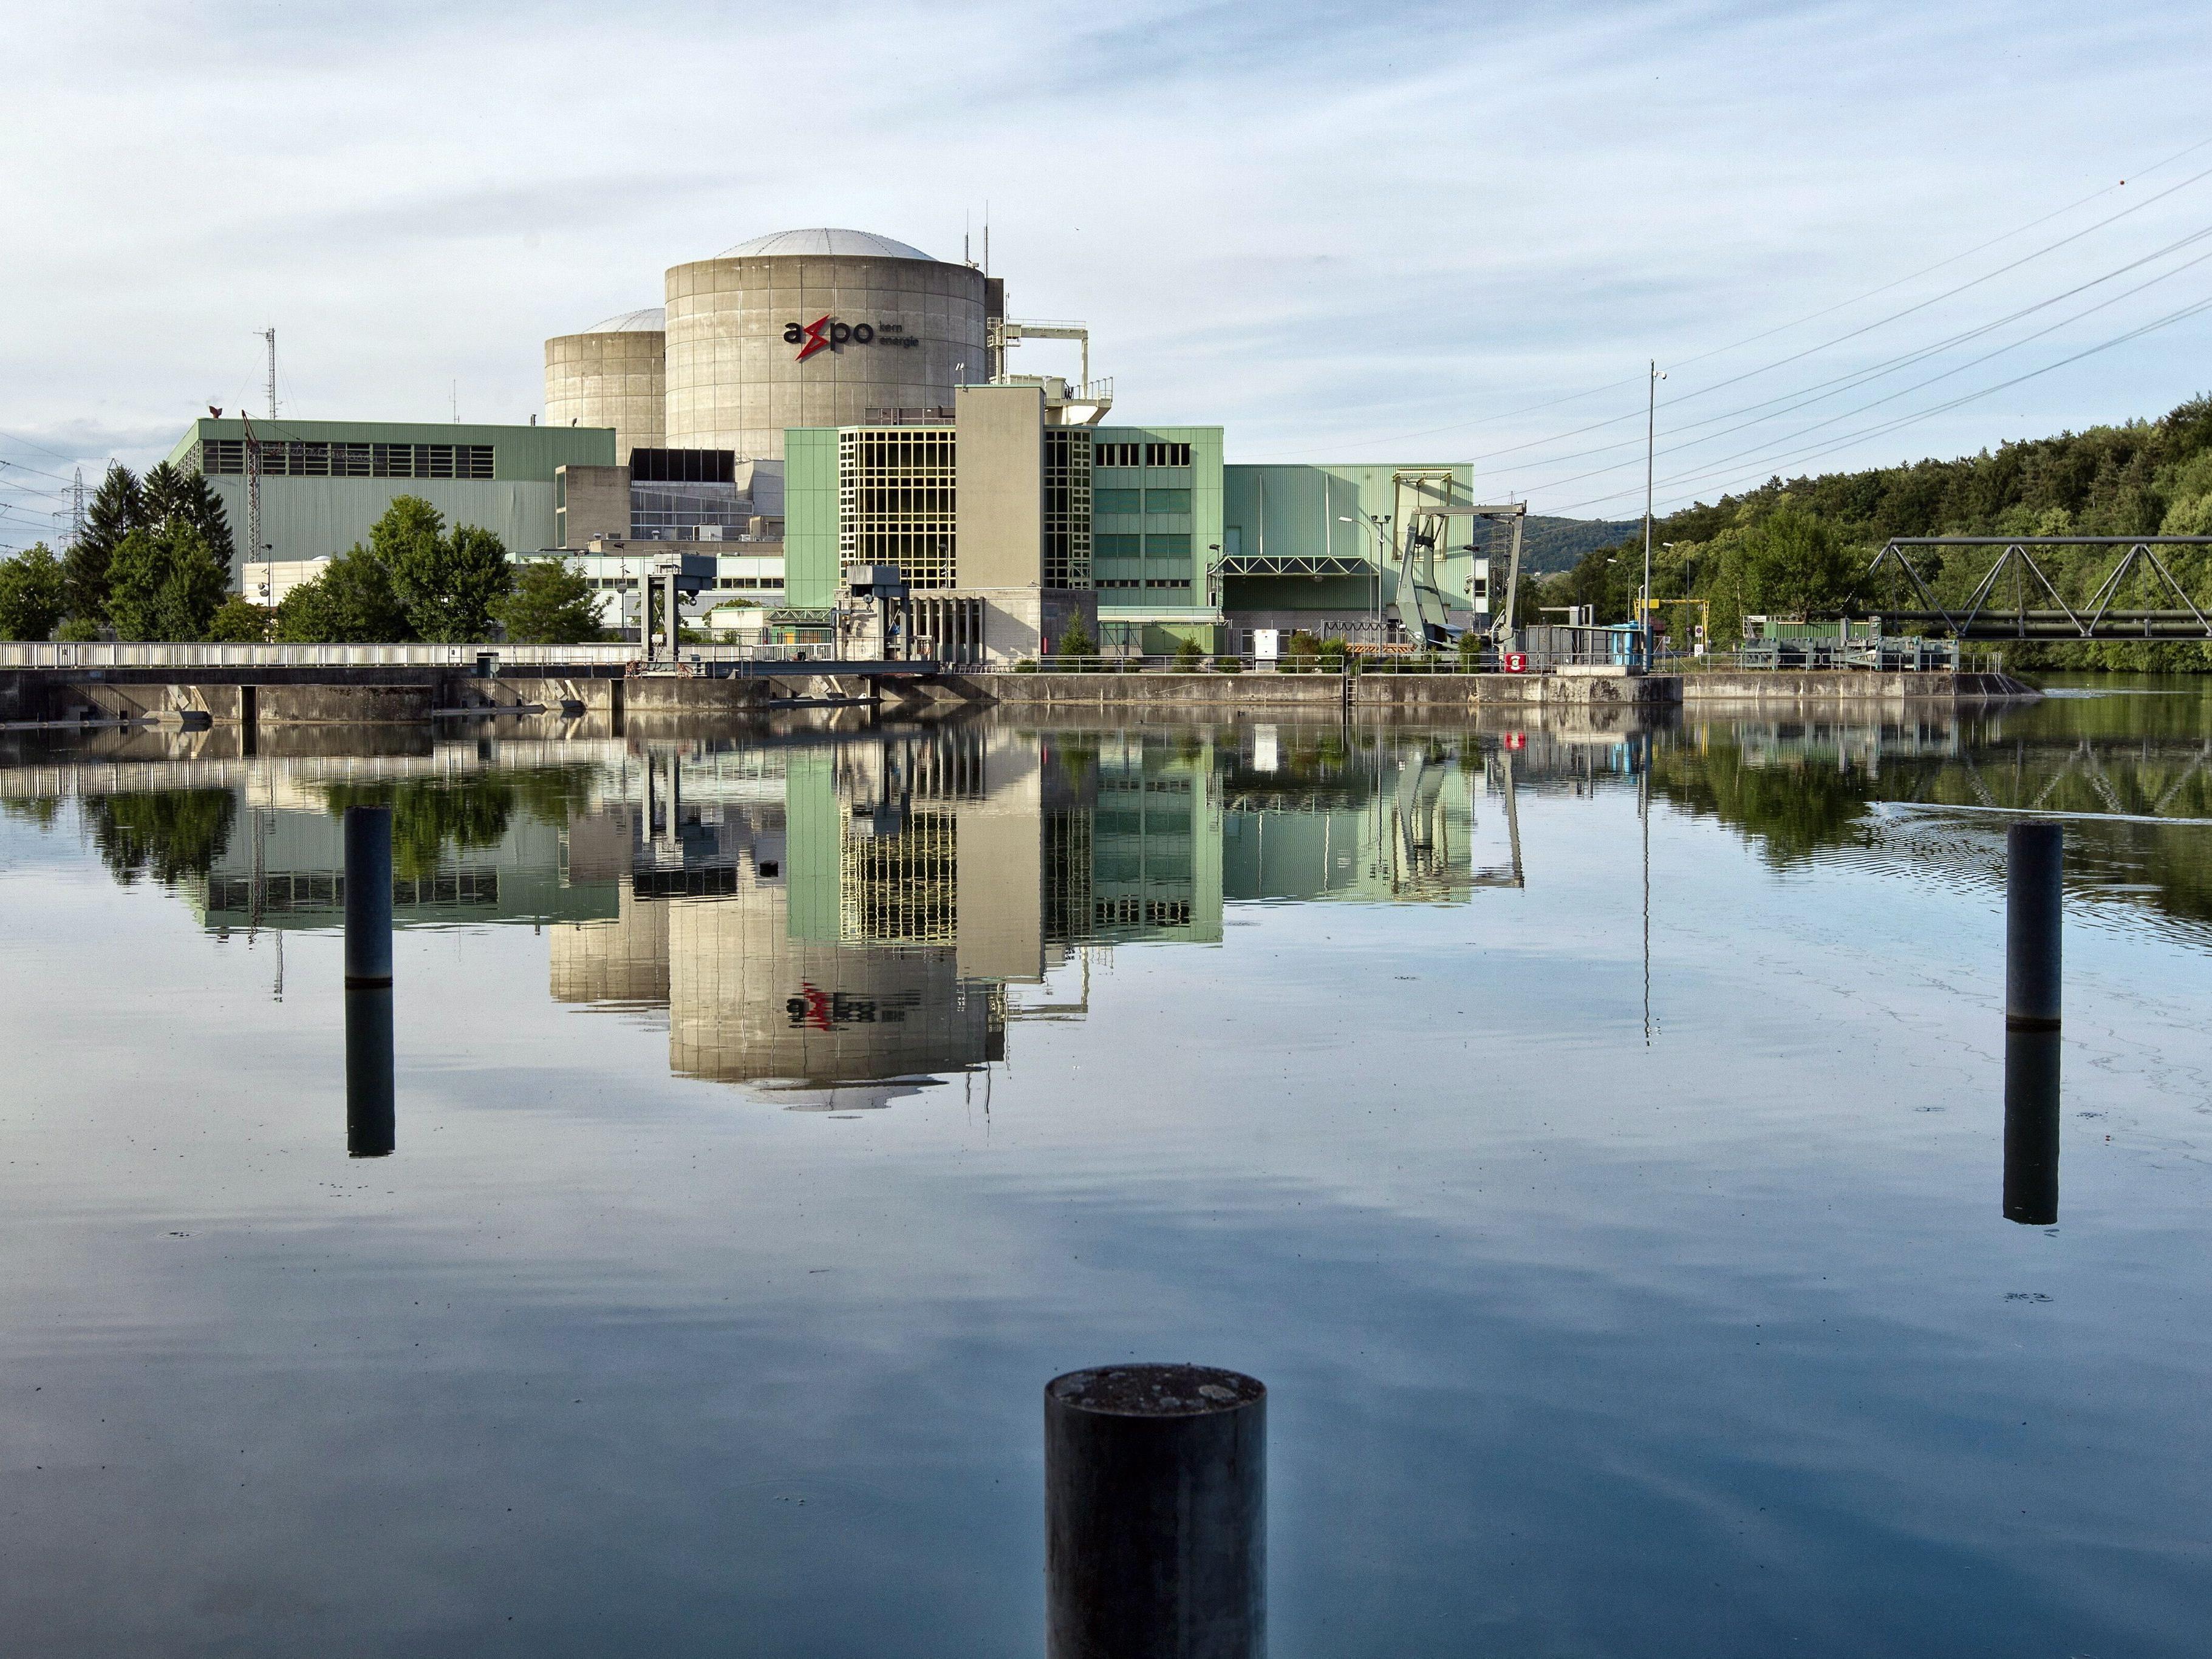 Energiekonzern Axpo will 700 Millionen Franken in Beznau investieren.